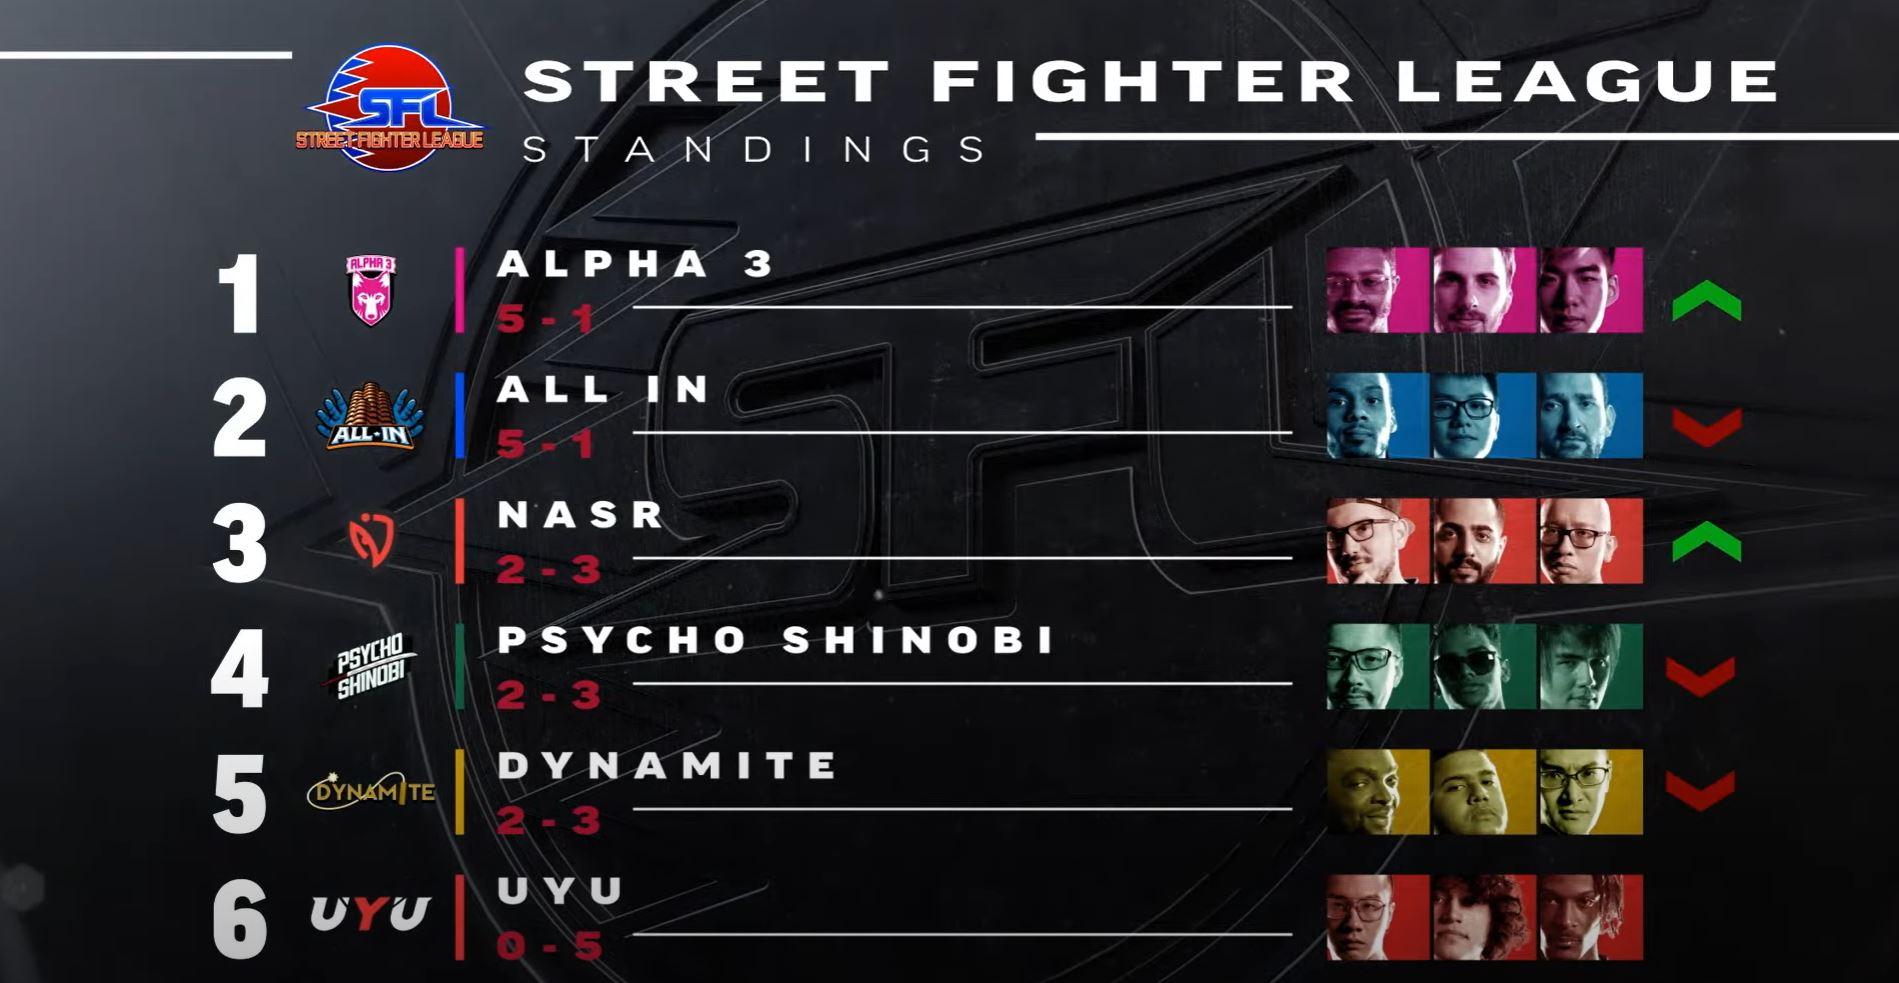 Street Fighter League team standings.